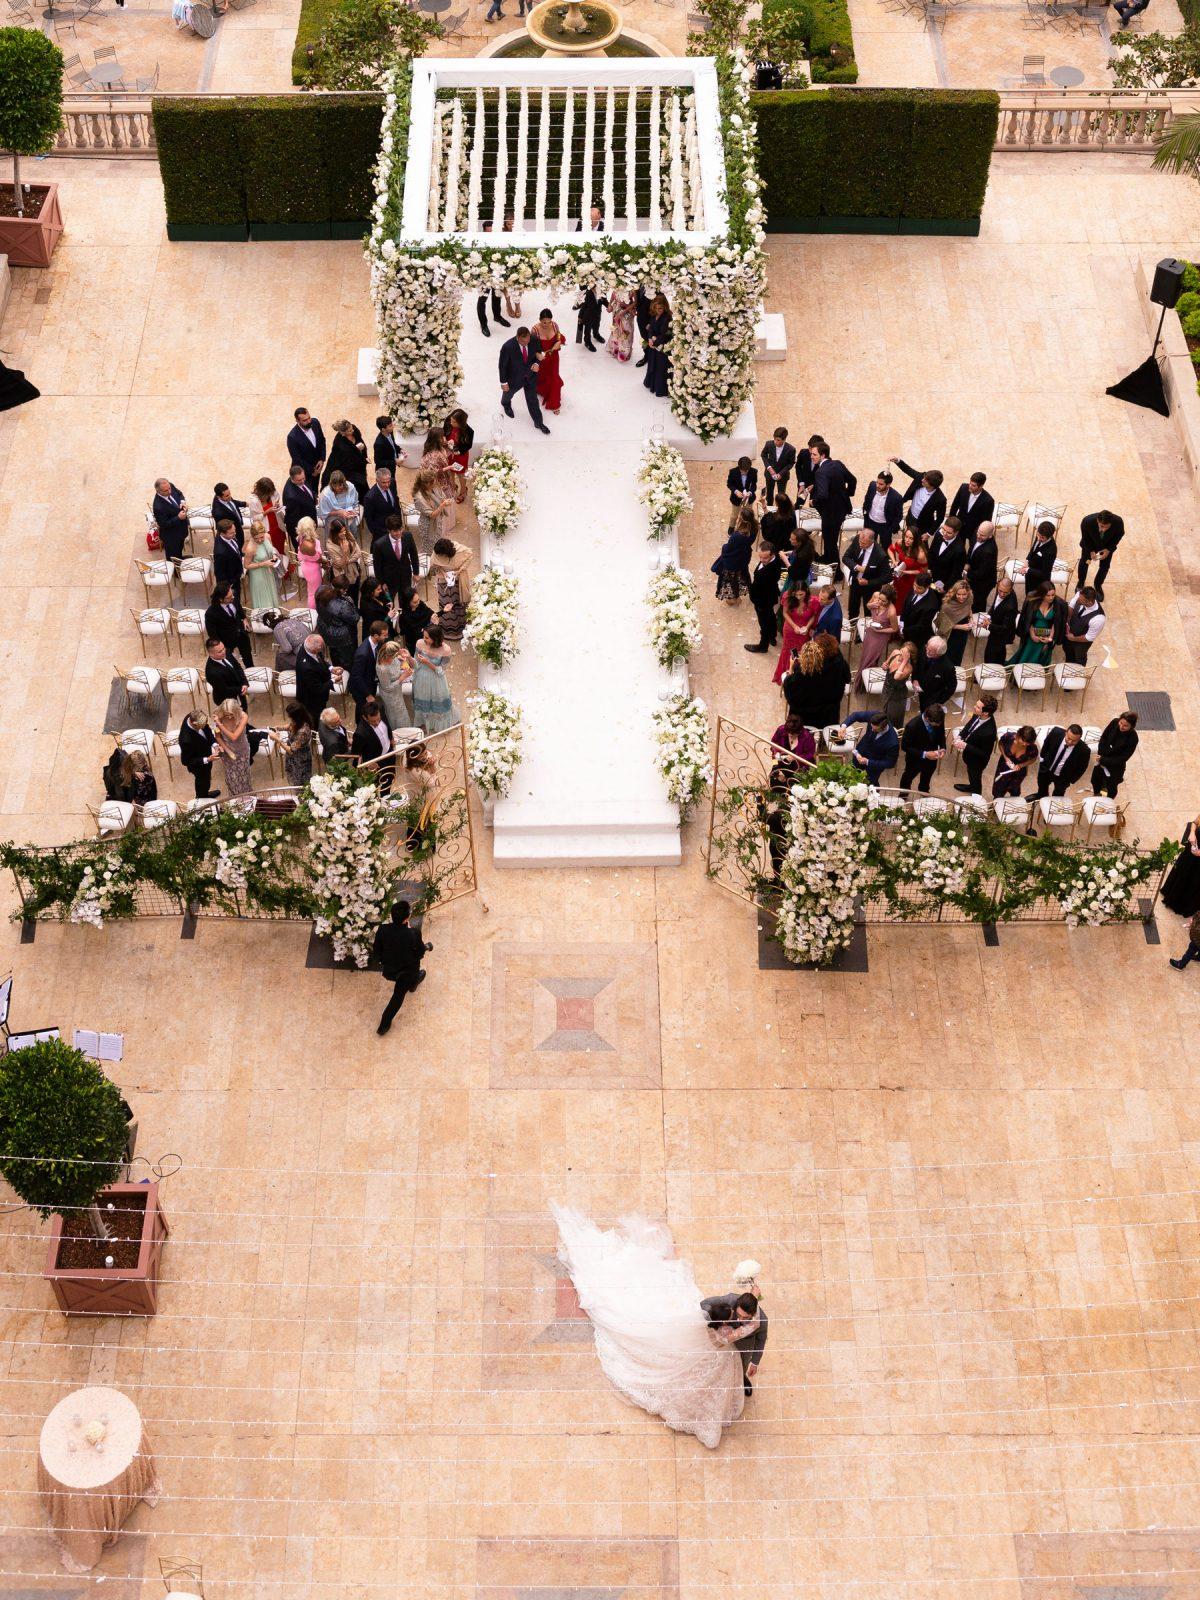 maria-eduardo-montage-beverly-hills-wedding-177.jpg